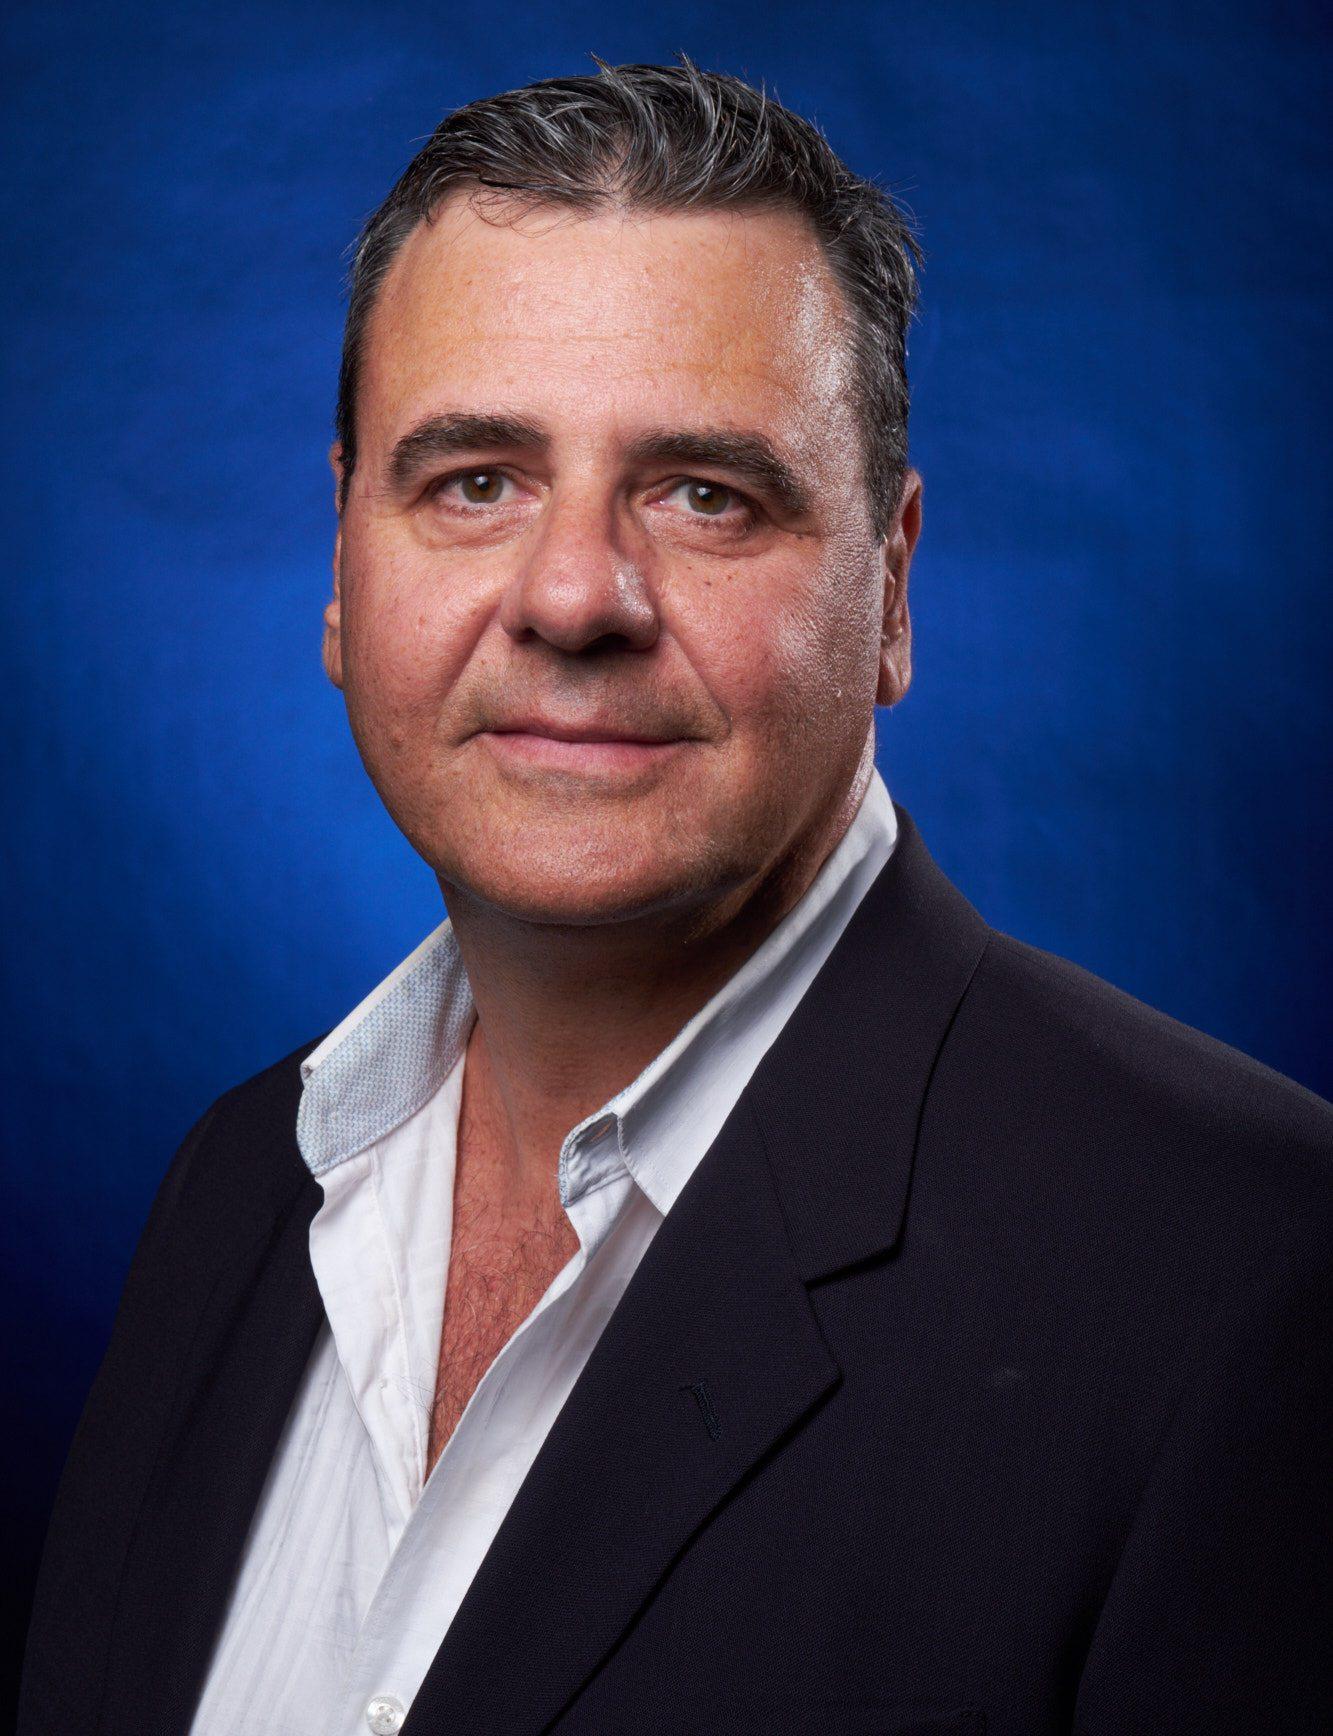 Andrew Berlanda